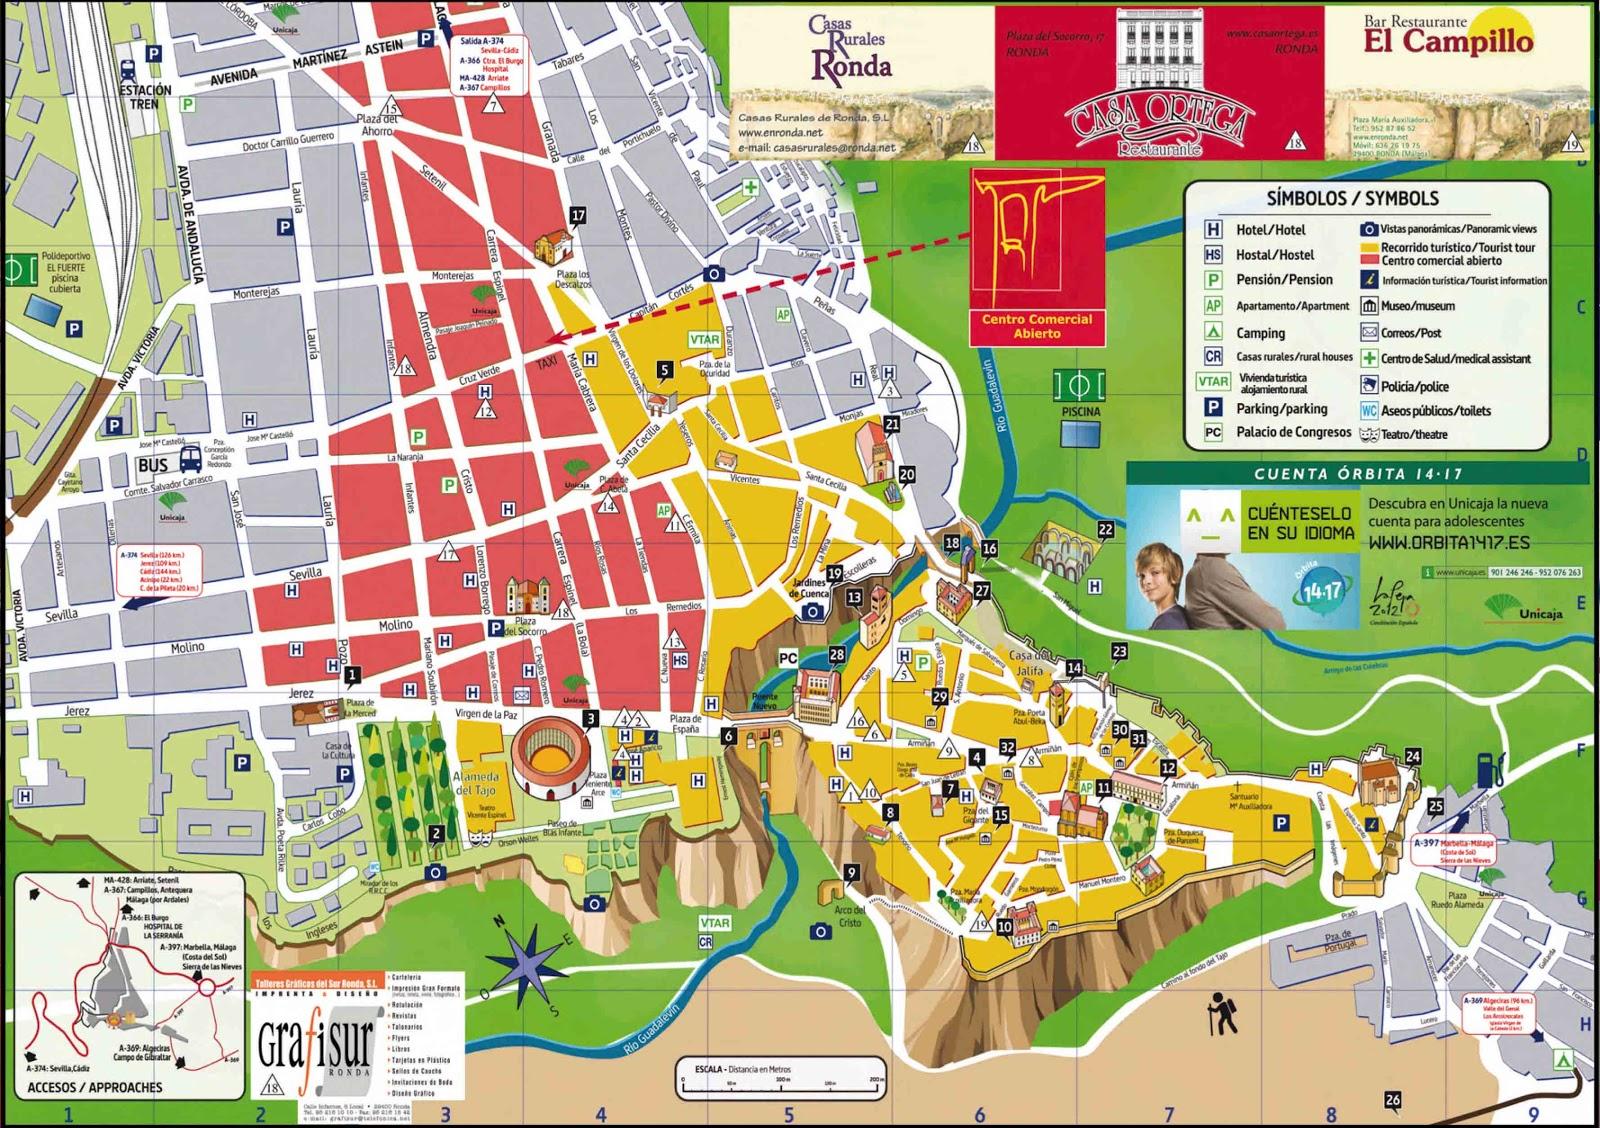 Mapa Turistico De Malaga.Ruta 76 Mapa De Ronda Malaga